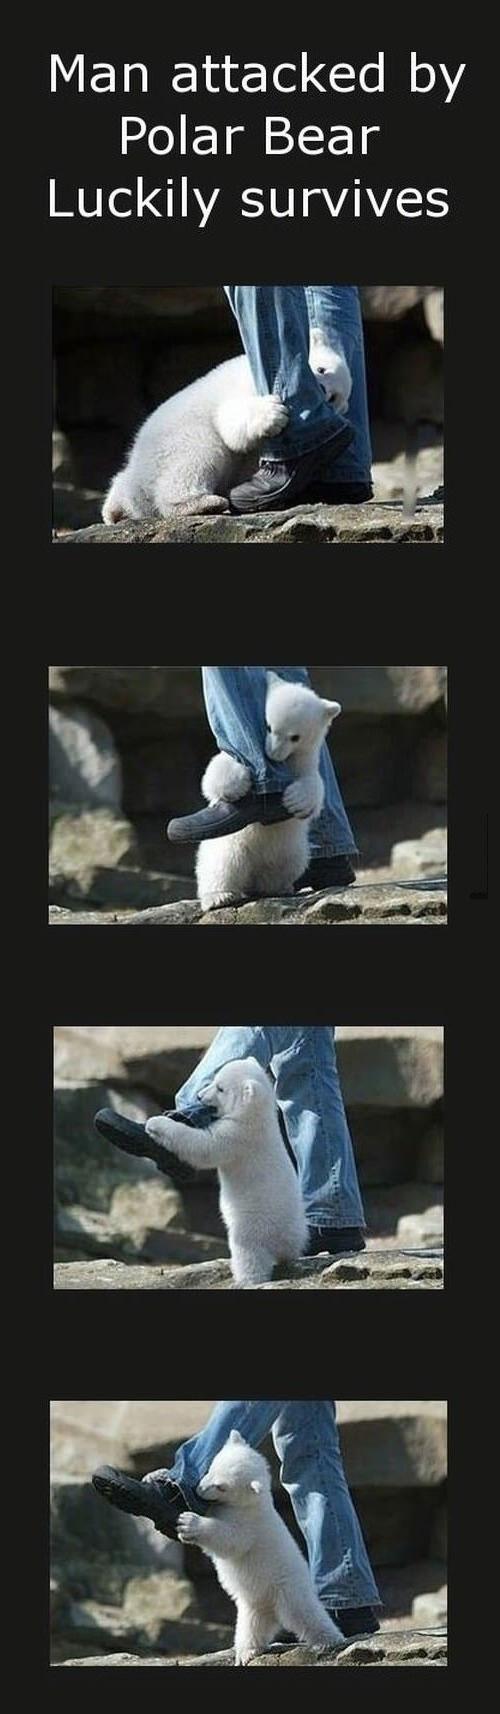 polar bear attack, survival